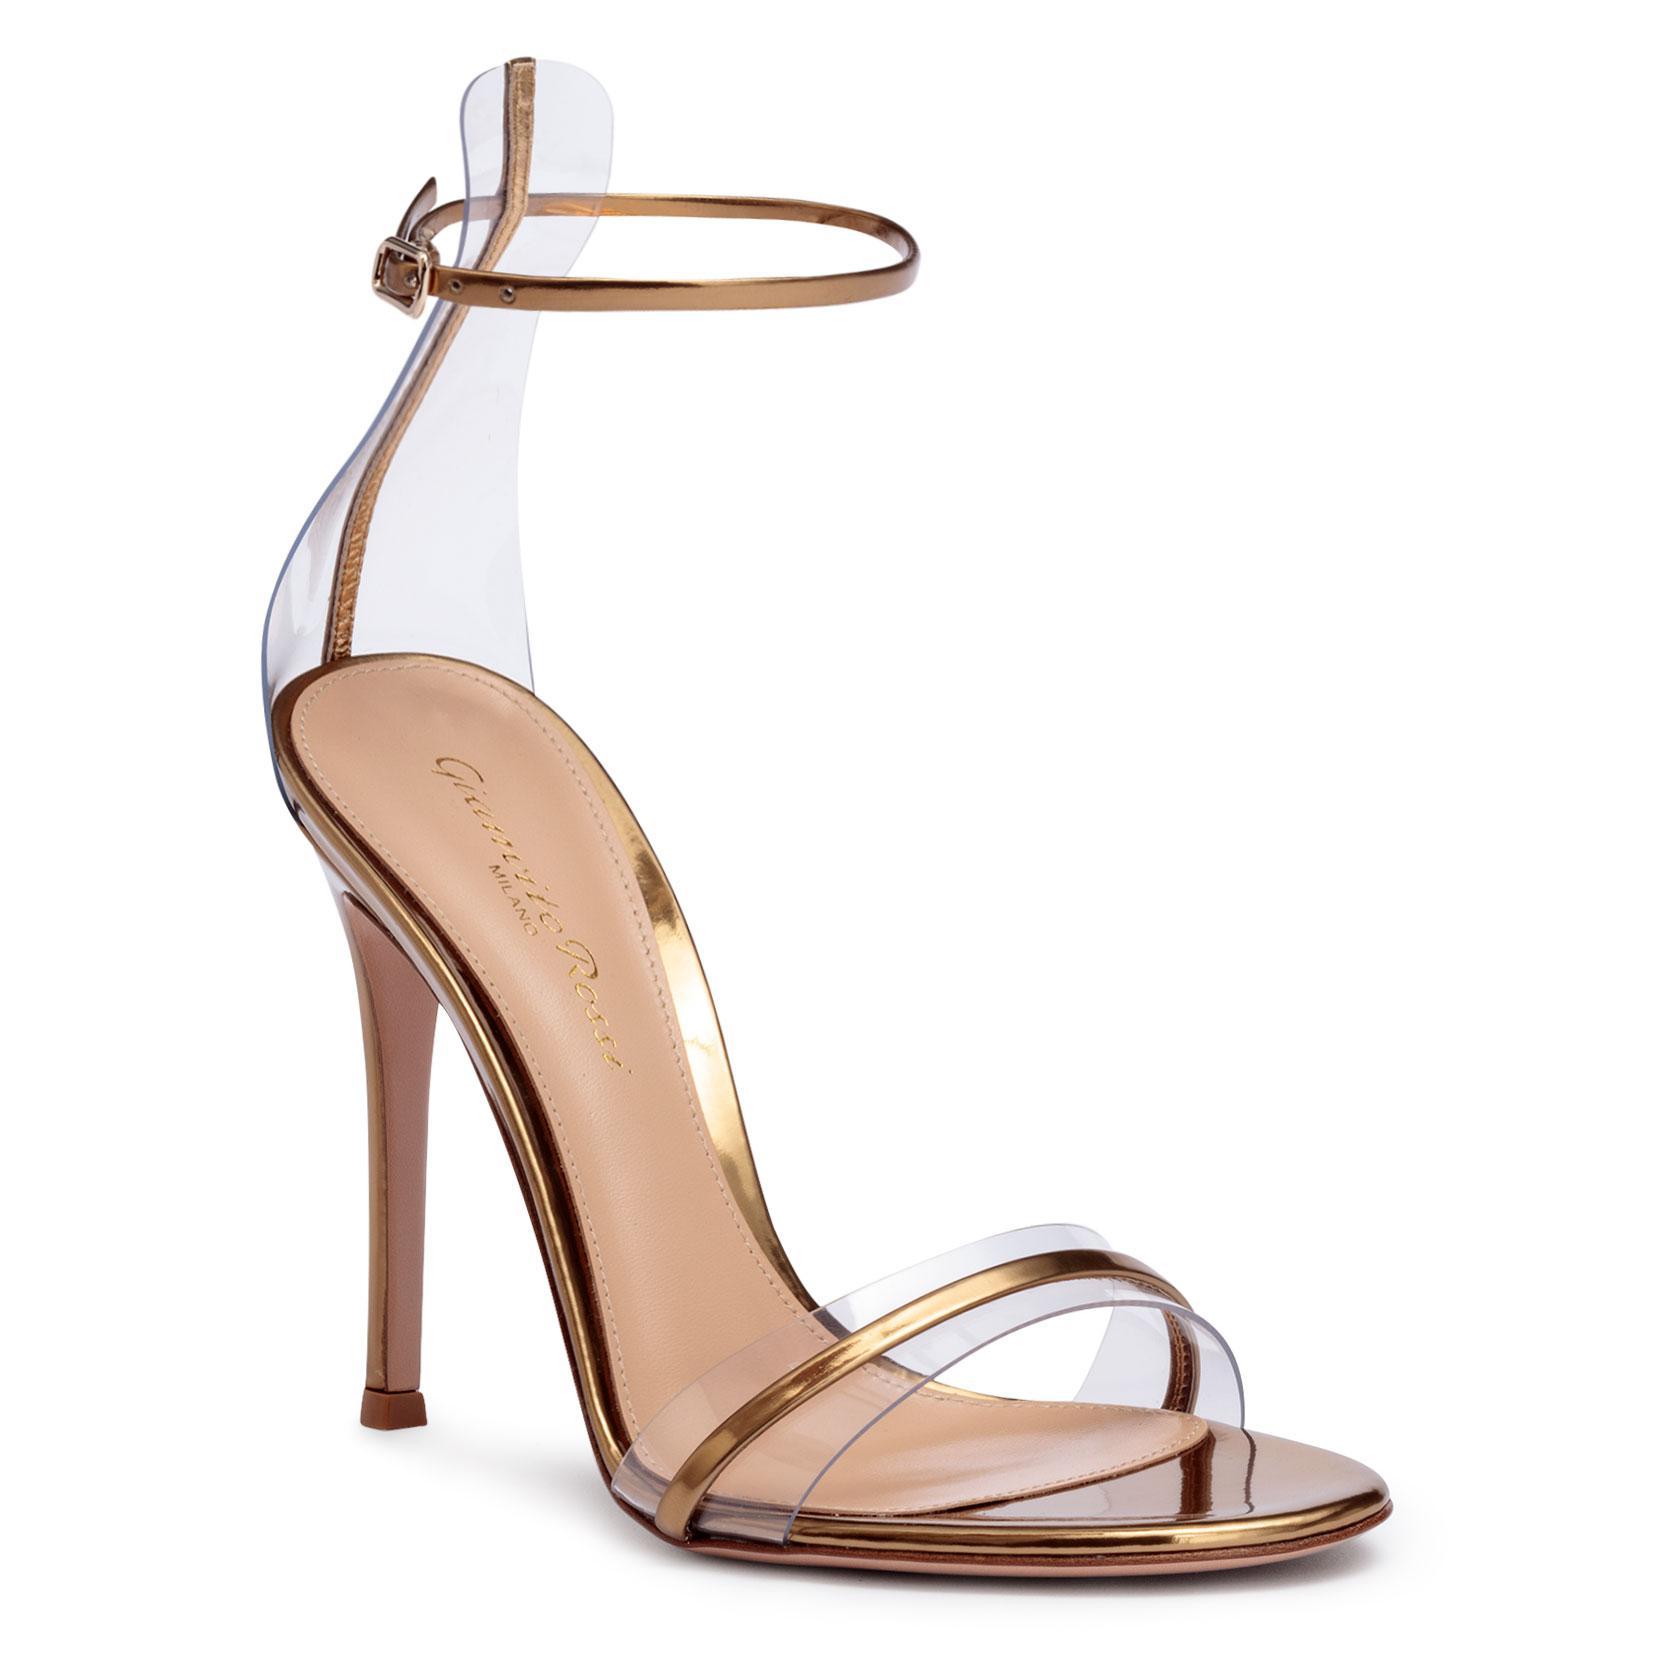 Portofino 105 pvc-trimmed bronze sandals Gianvito Rossi e5RlALOFs